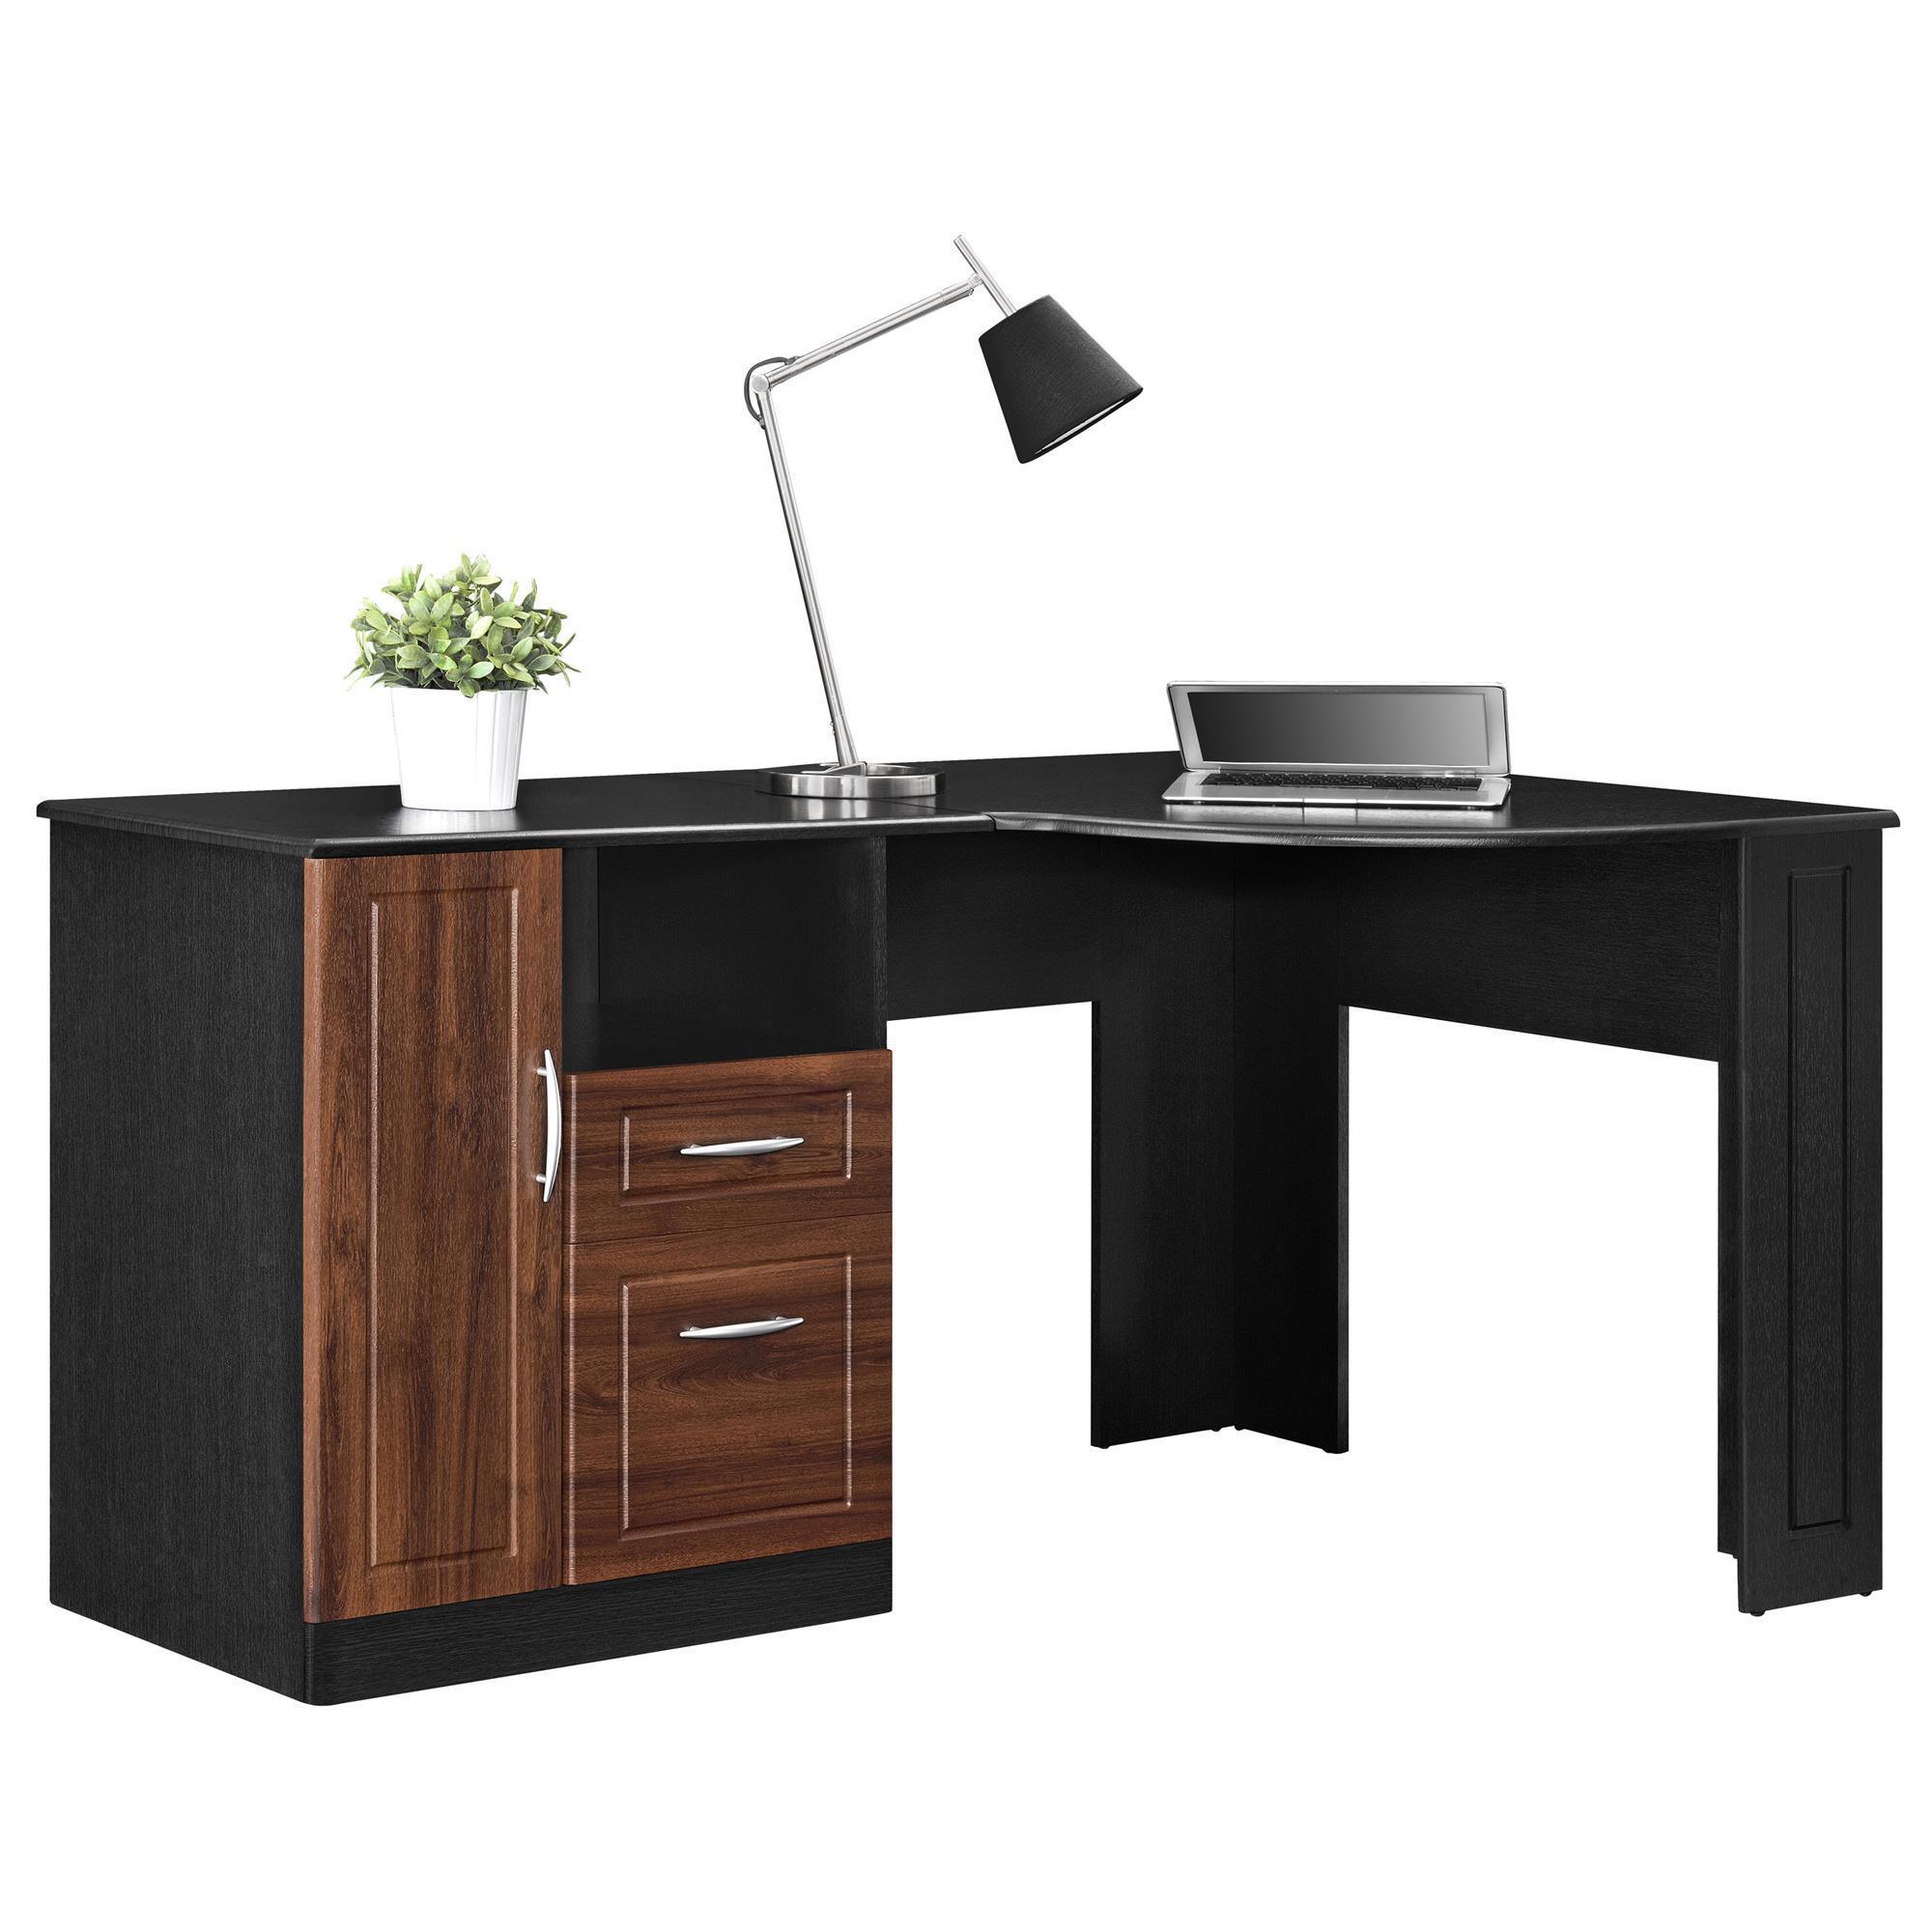 Shop ameriwood home avalon cherry black corner desk free shipping today overstock com 12614143